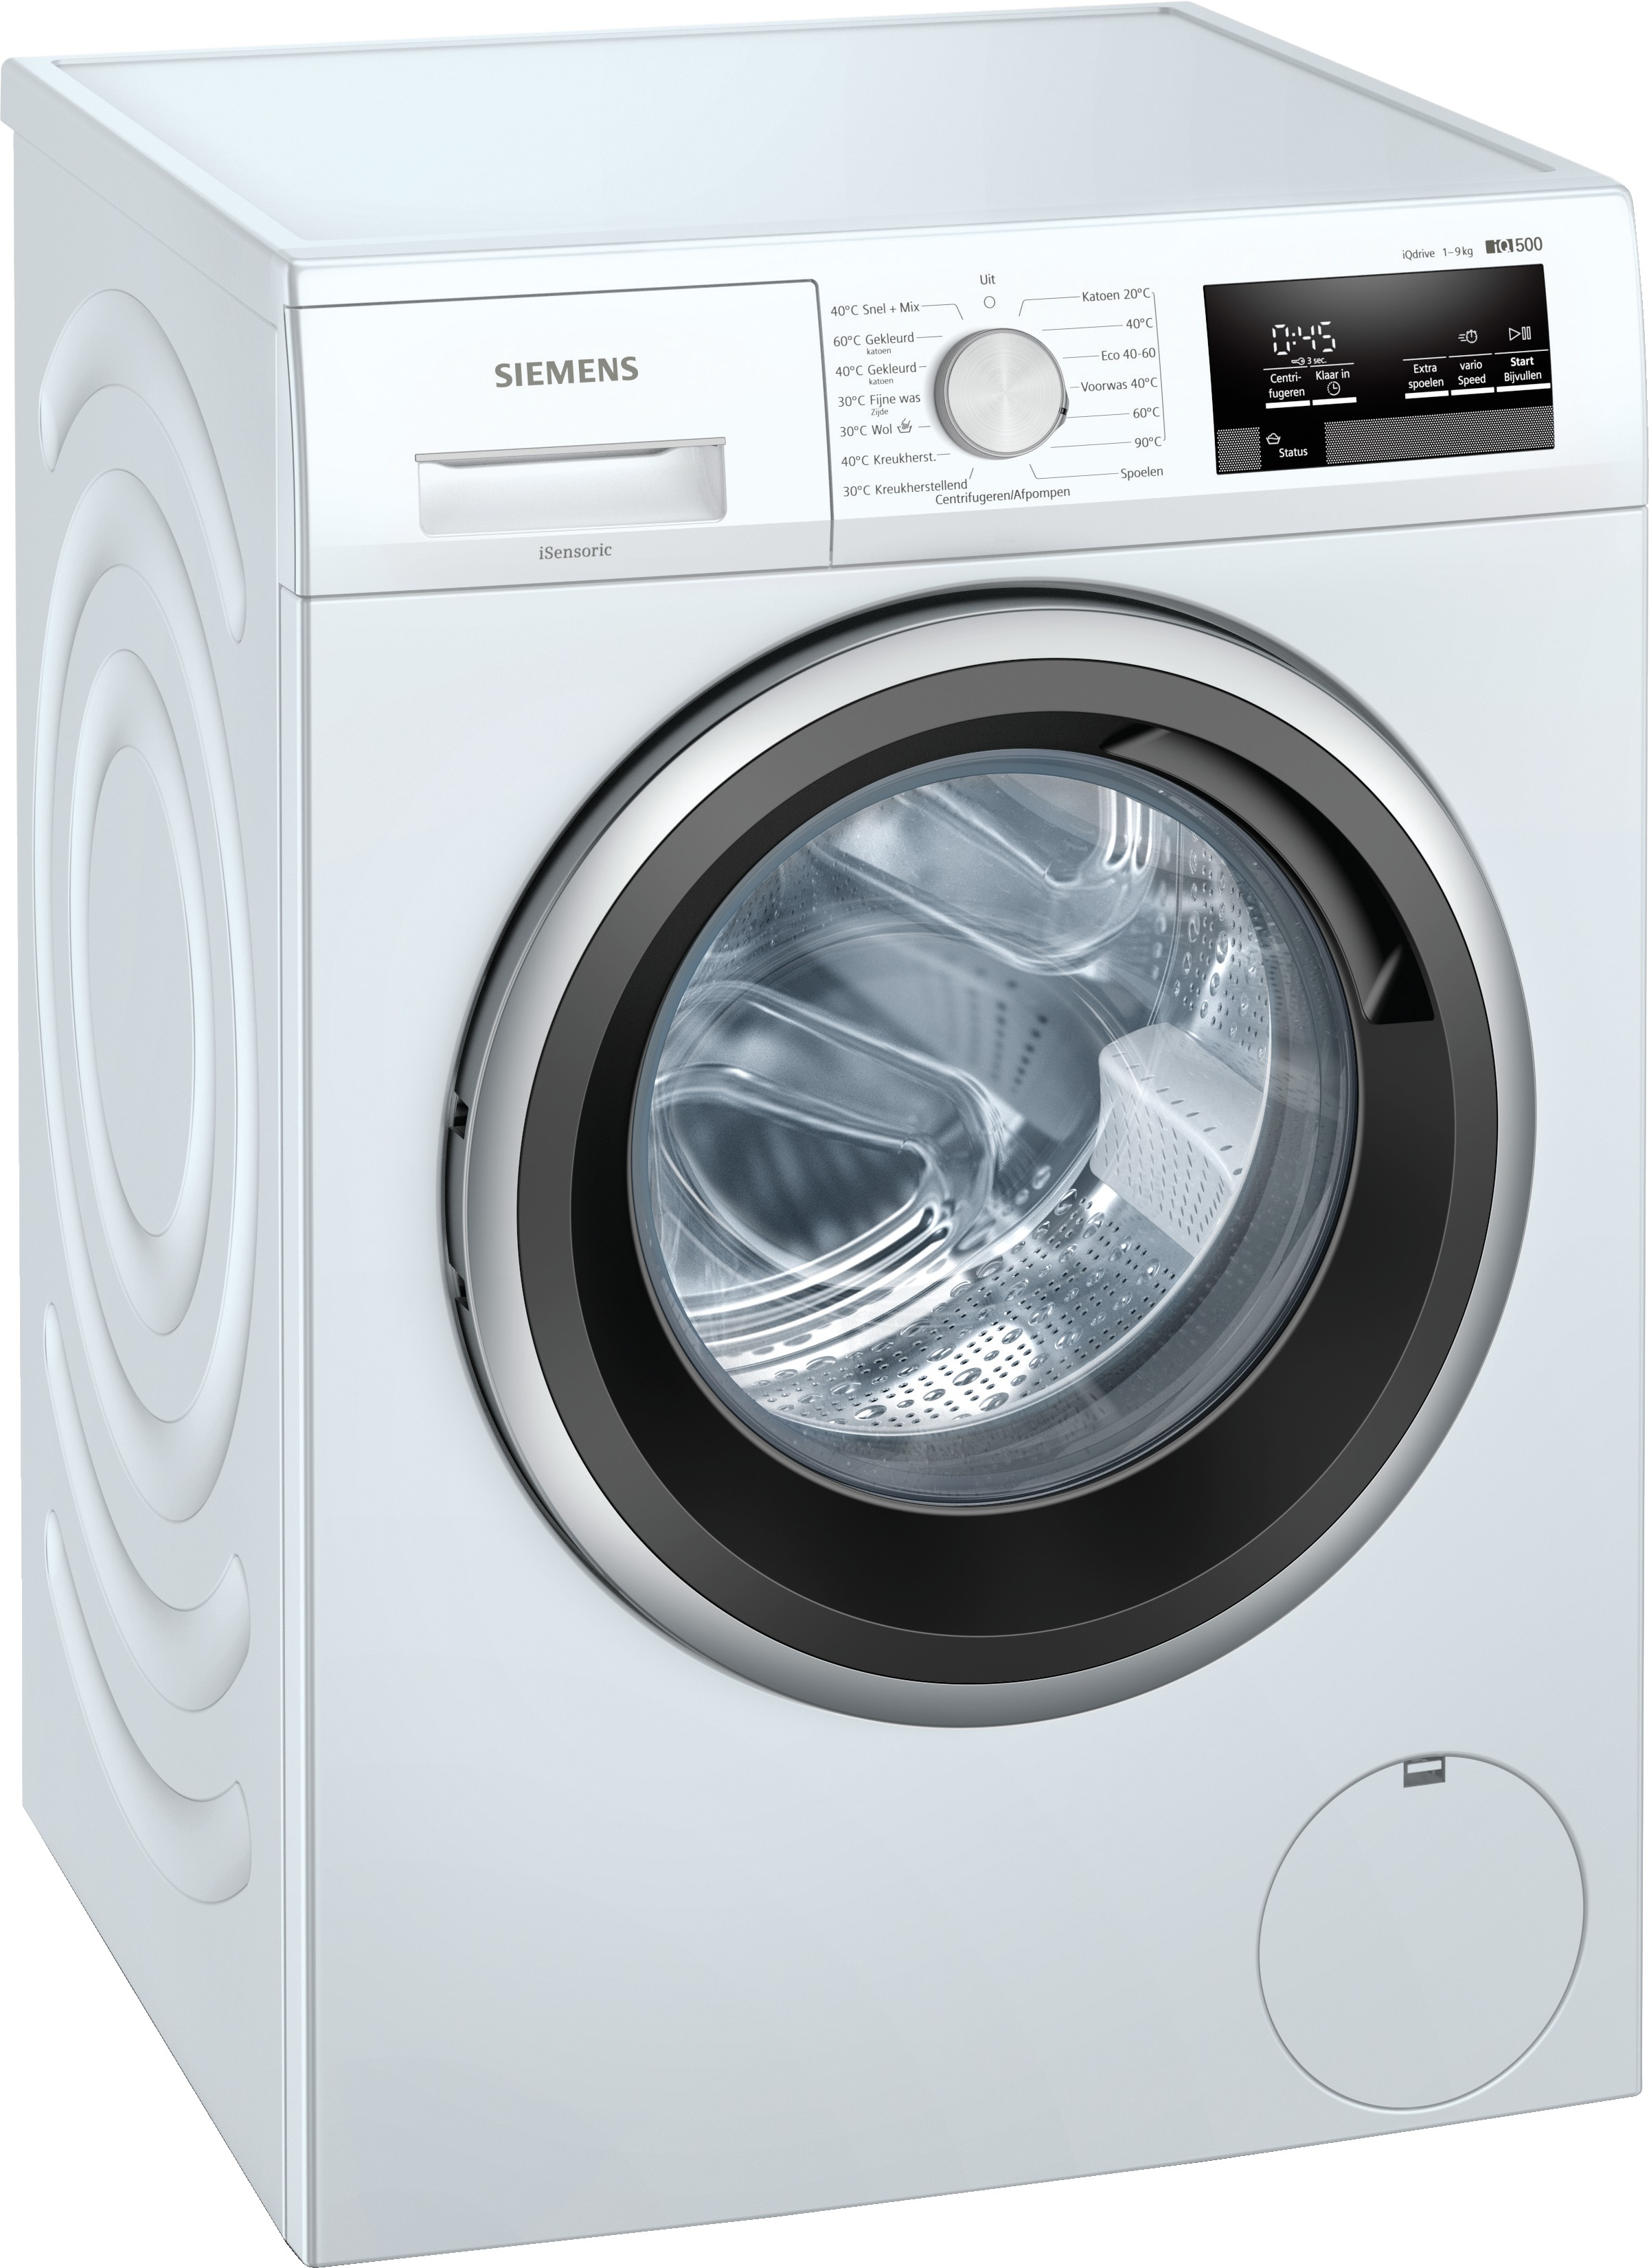 Siemens WM14UU00NL wasmachine - Prijsvergelijk